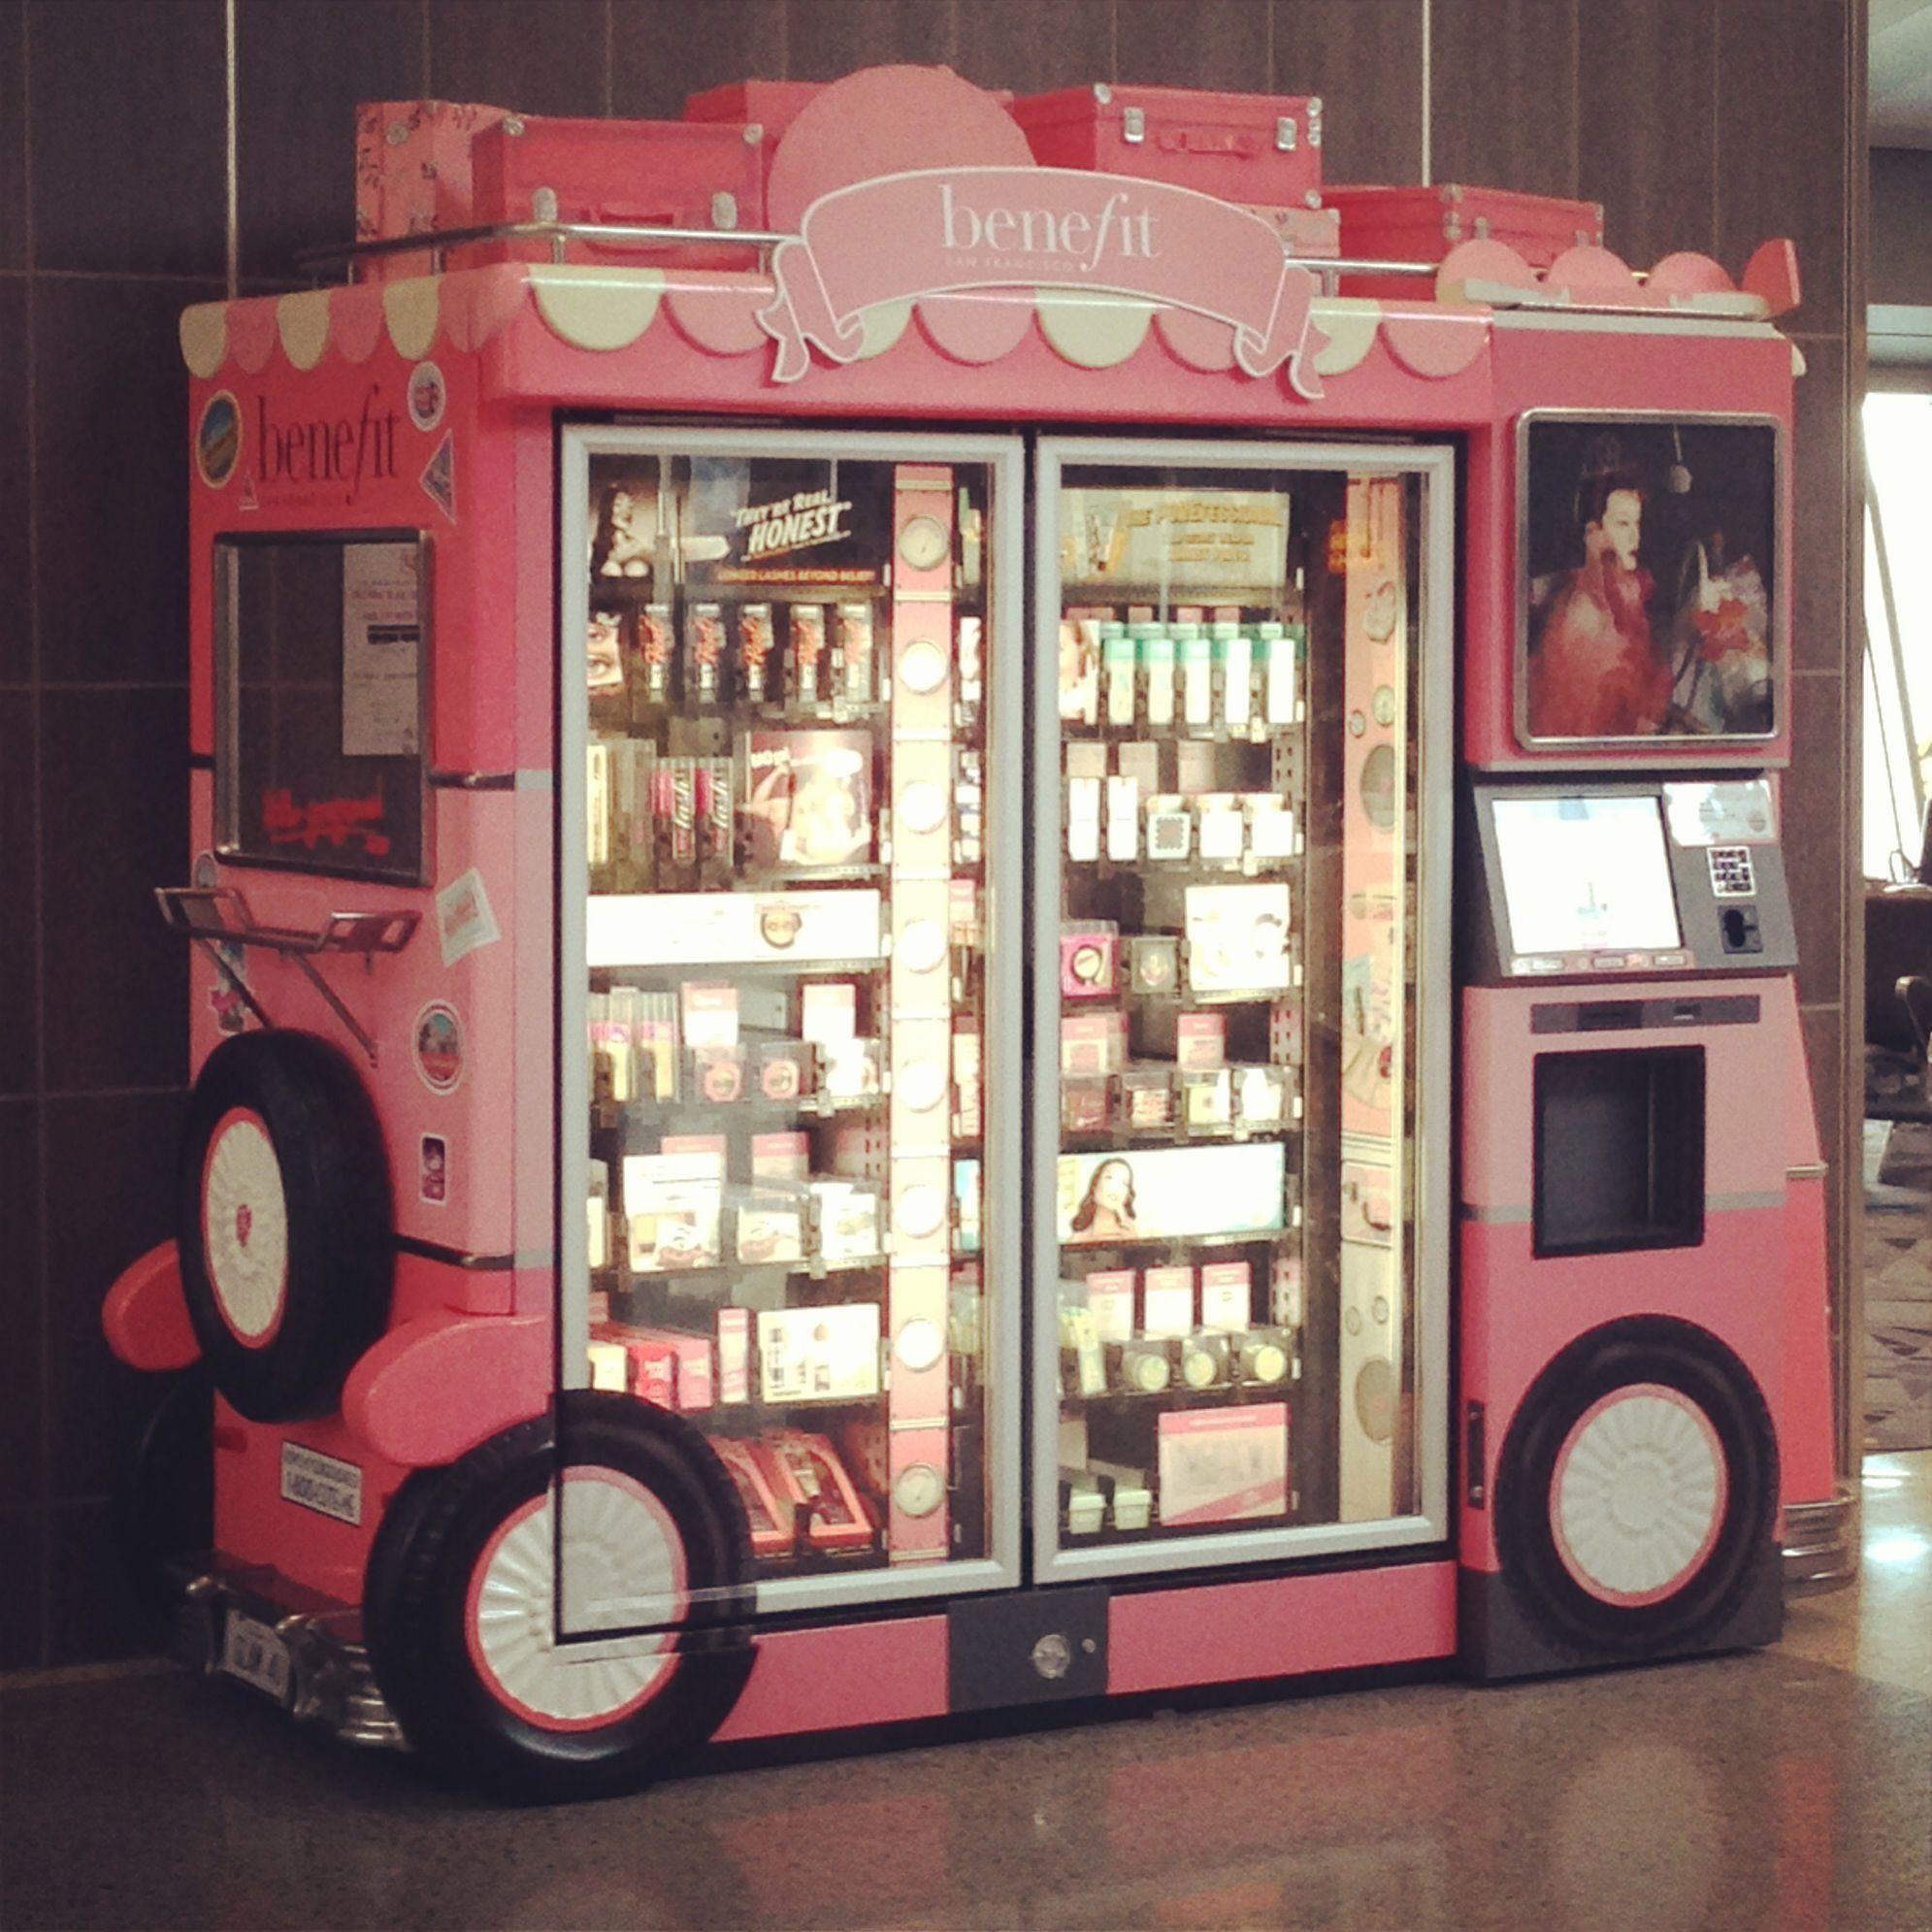 Benefit Cosmetics vending machine at Las Vegas airport